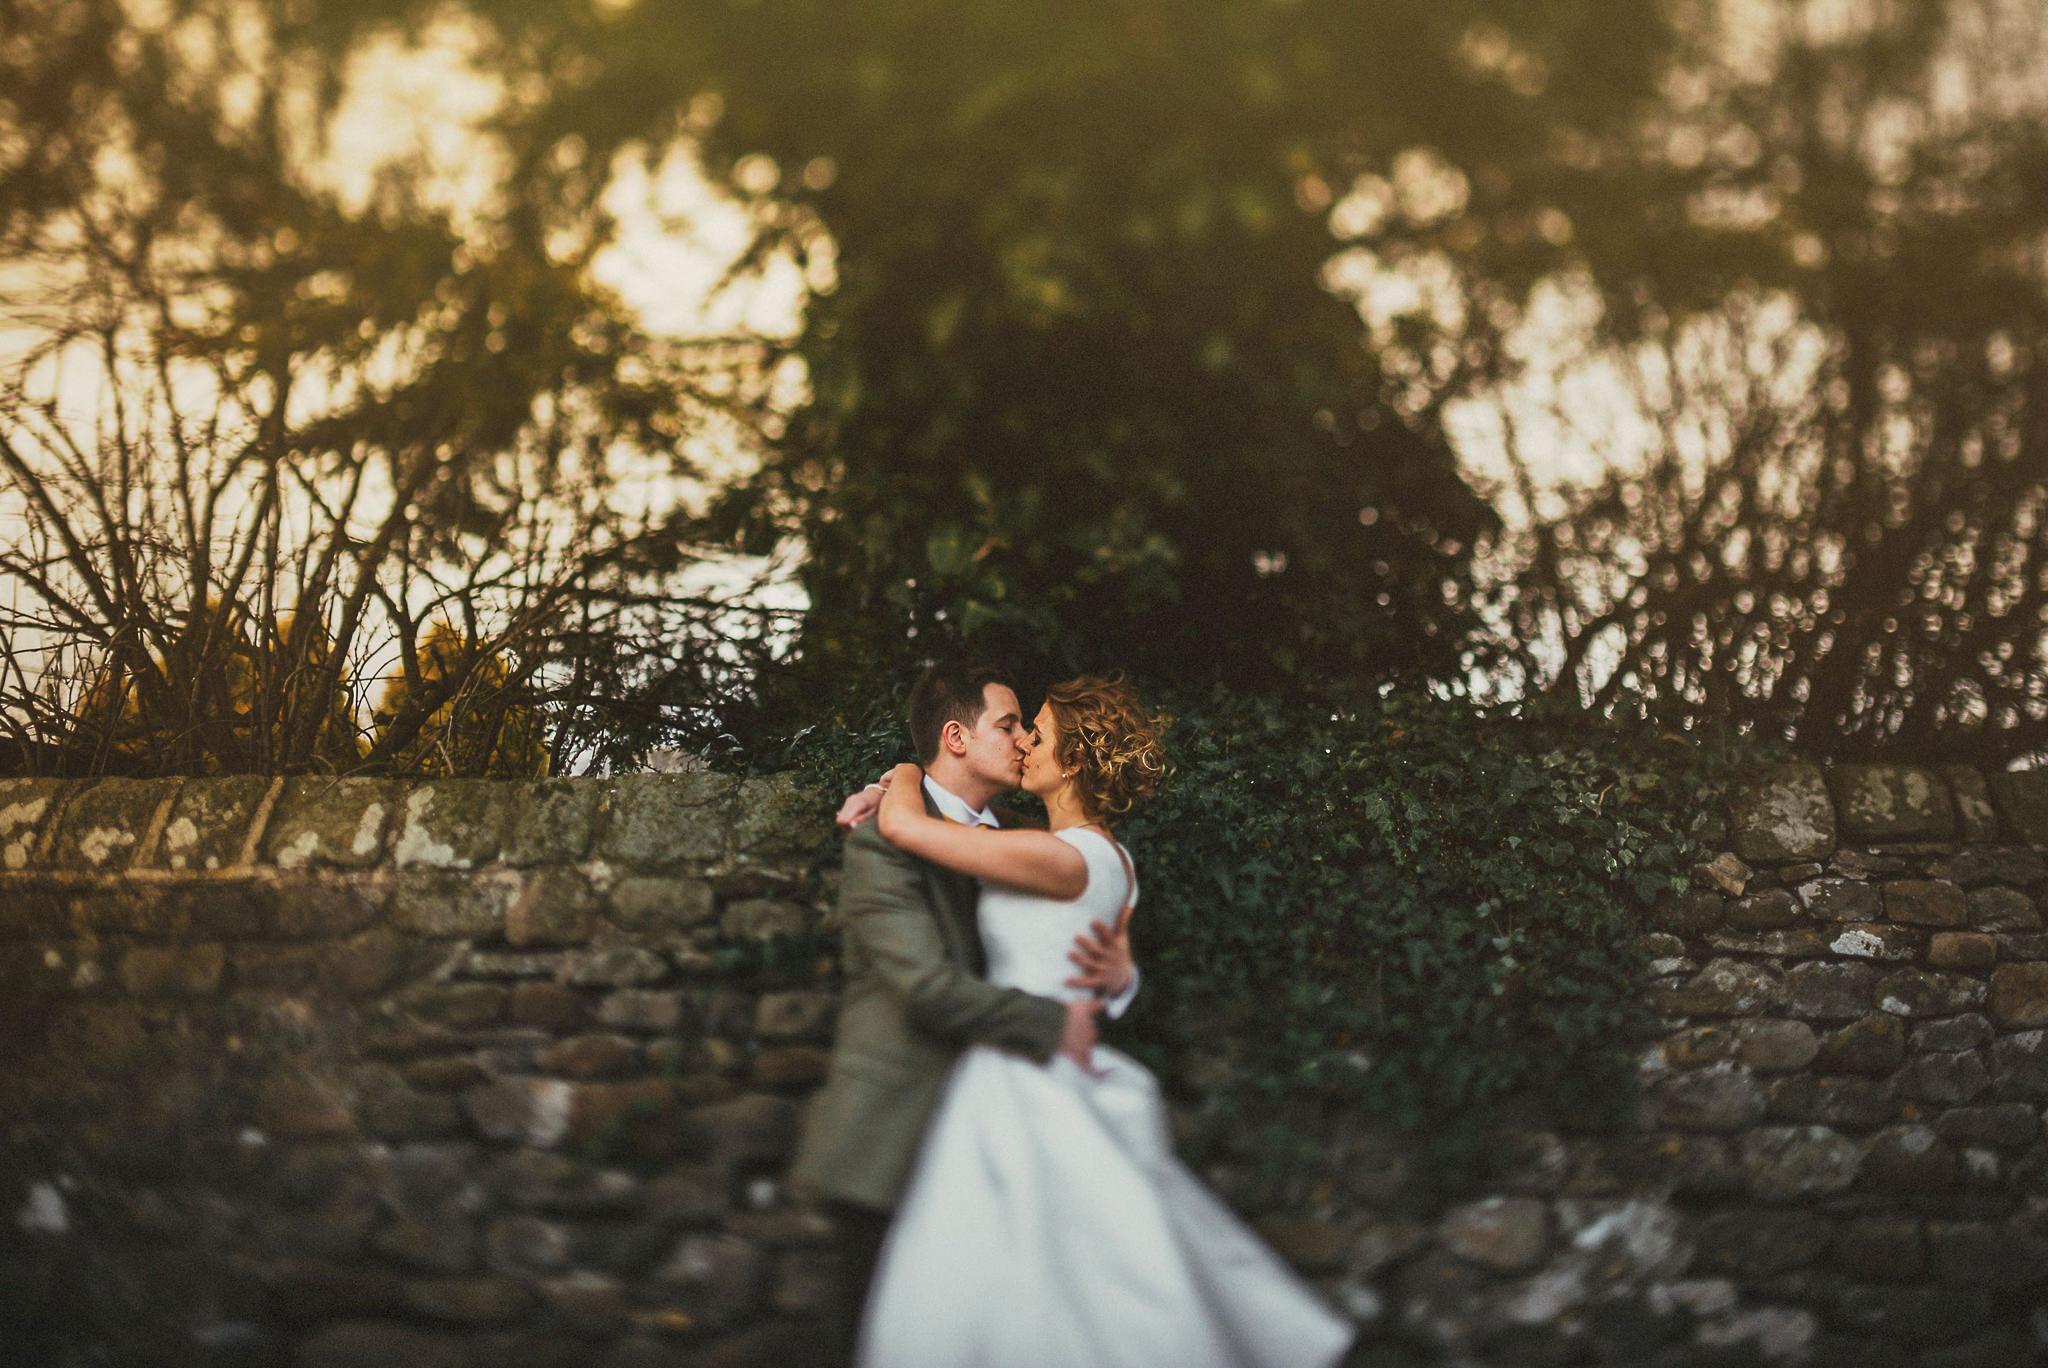 Lancashire-Creative-natural-documentary-wedding-photography-90082